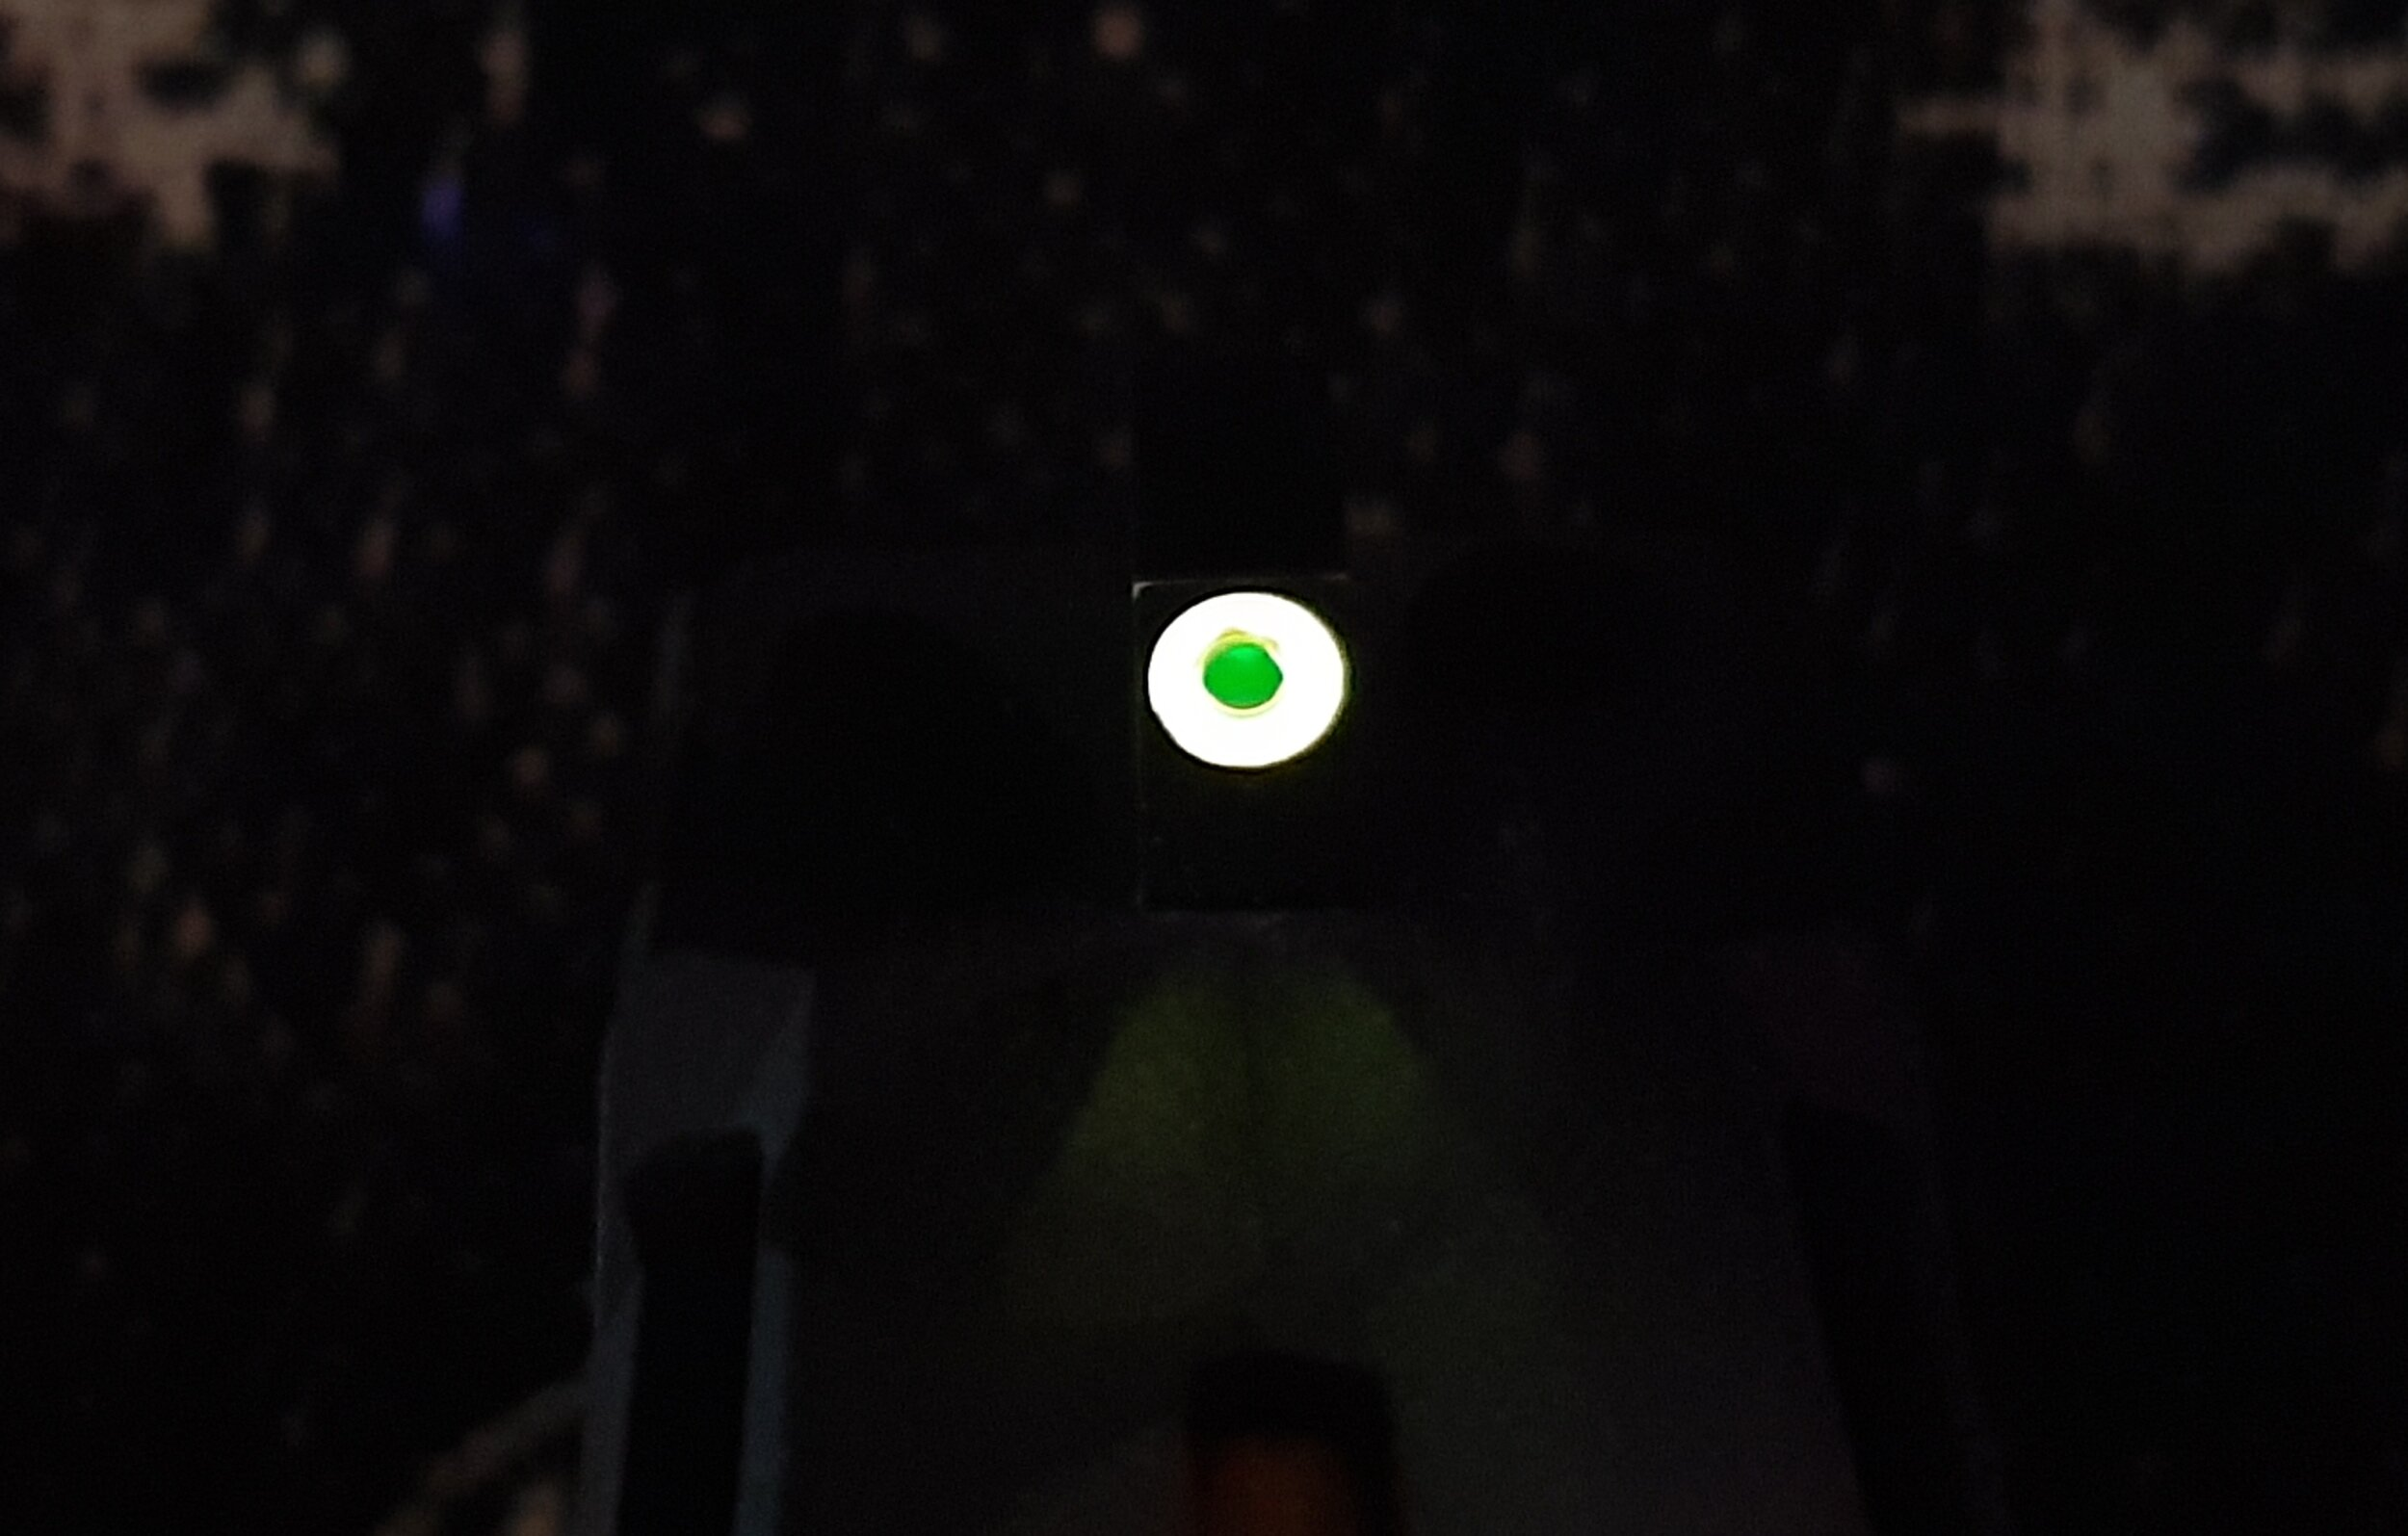 After shining flashlight on front sight (photoluminescent glow)